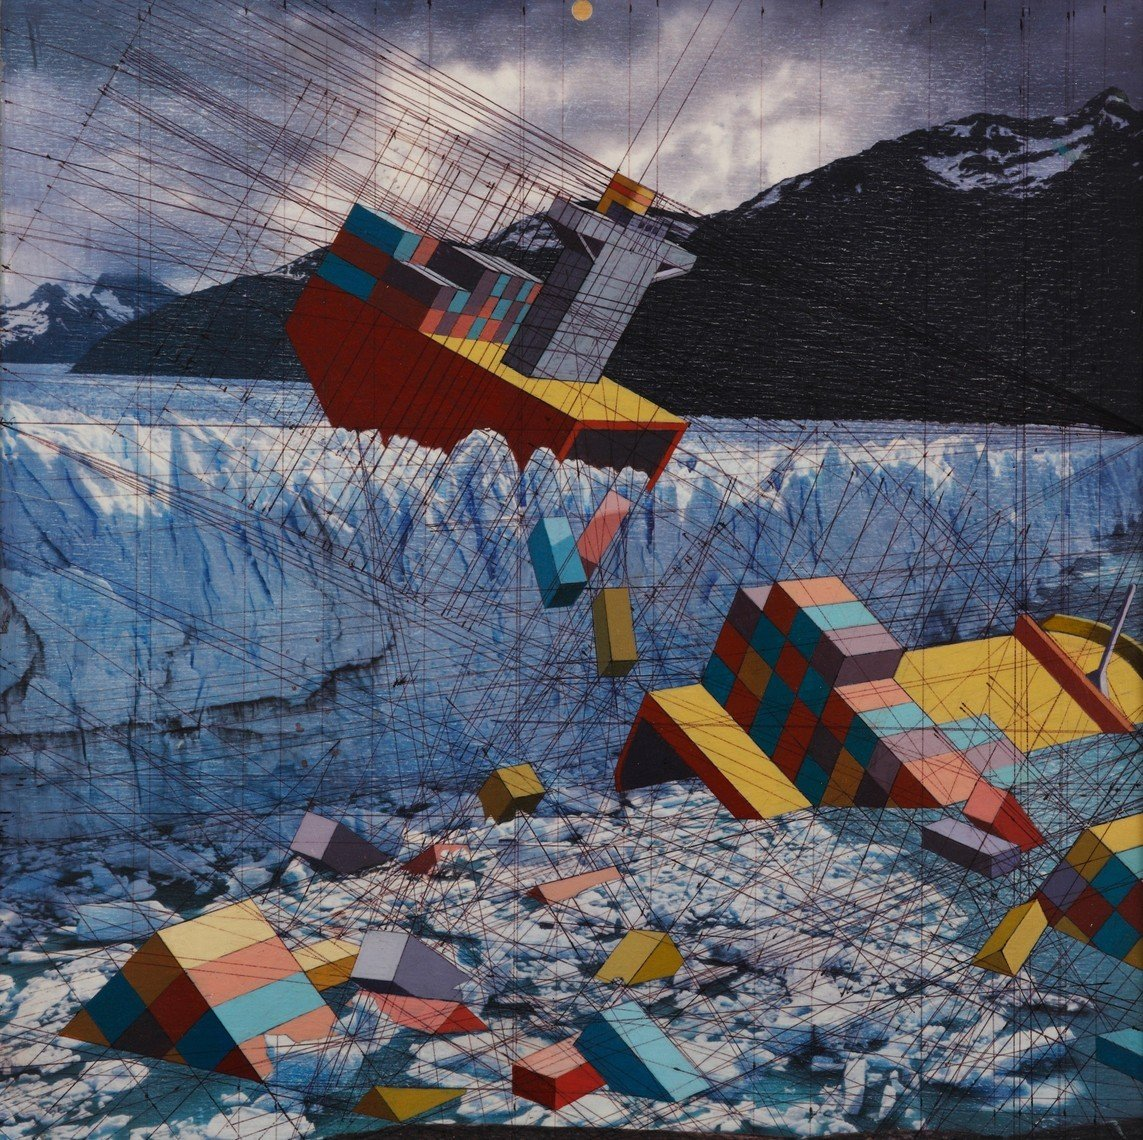 Mary Iverson - Glacier